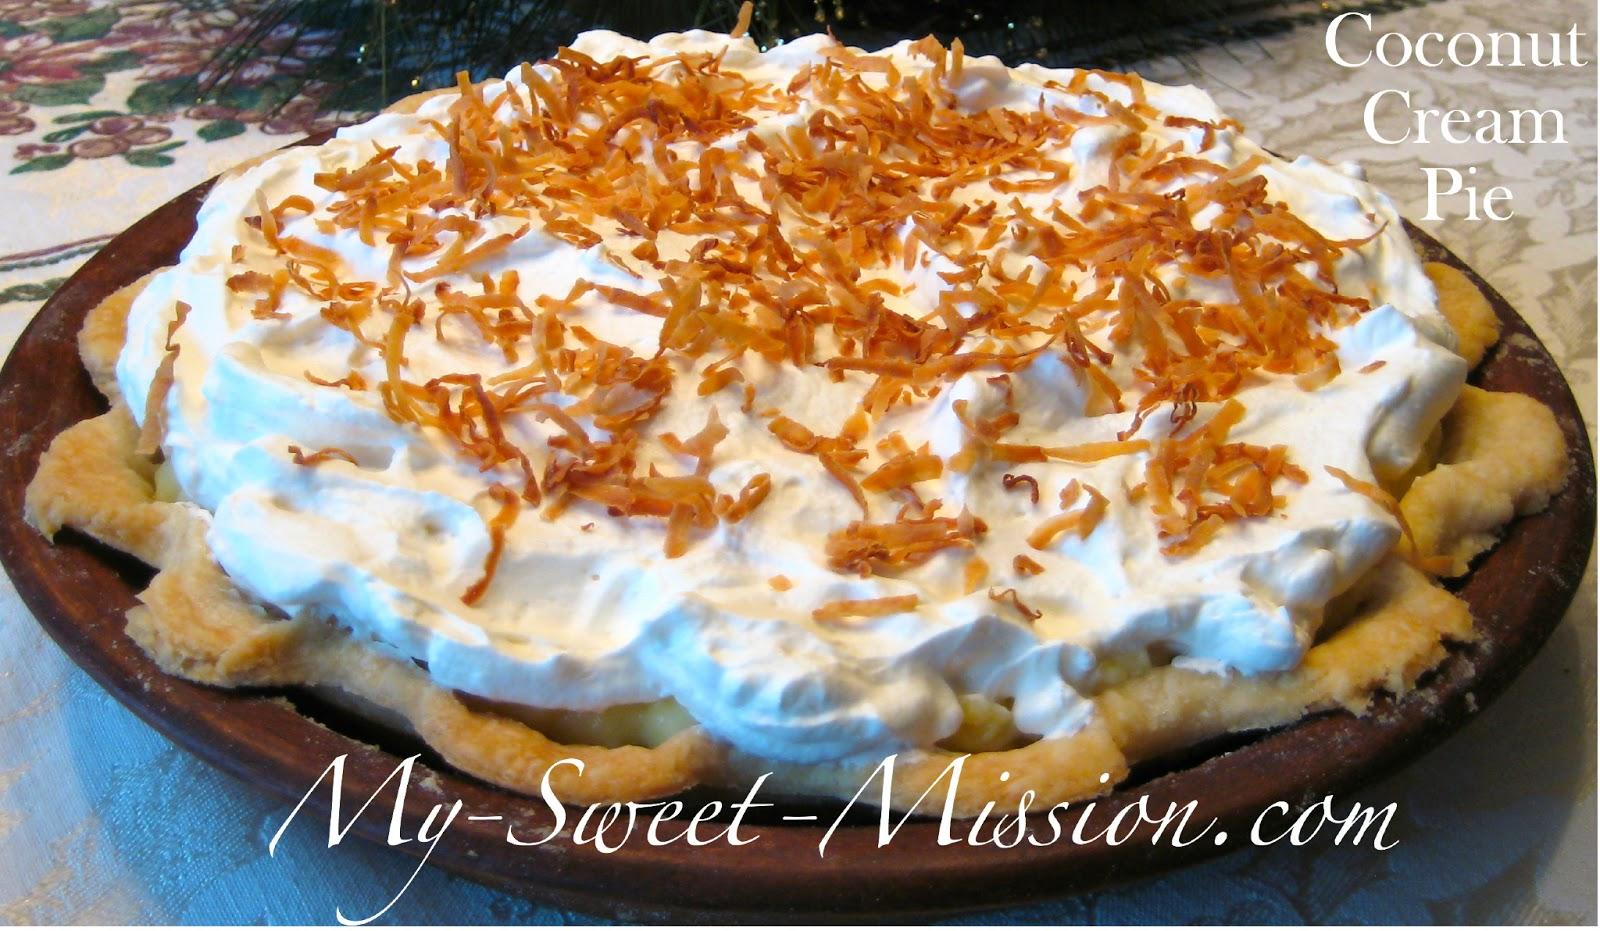 http://www.my-sweet-mission.com/2012/12/coconut-cream-pie.html